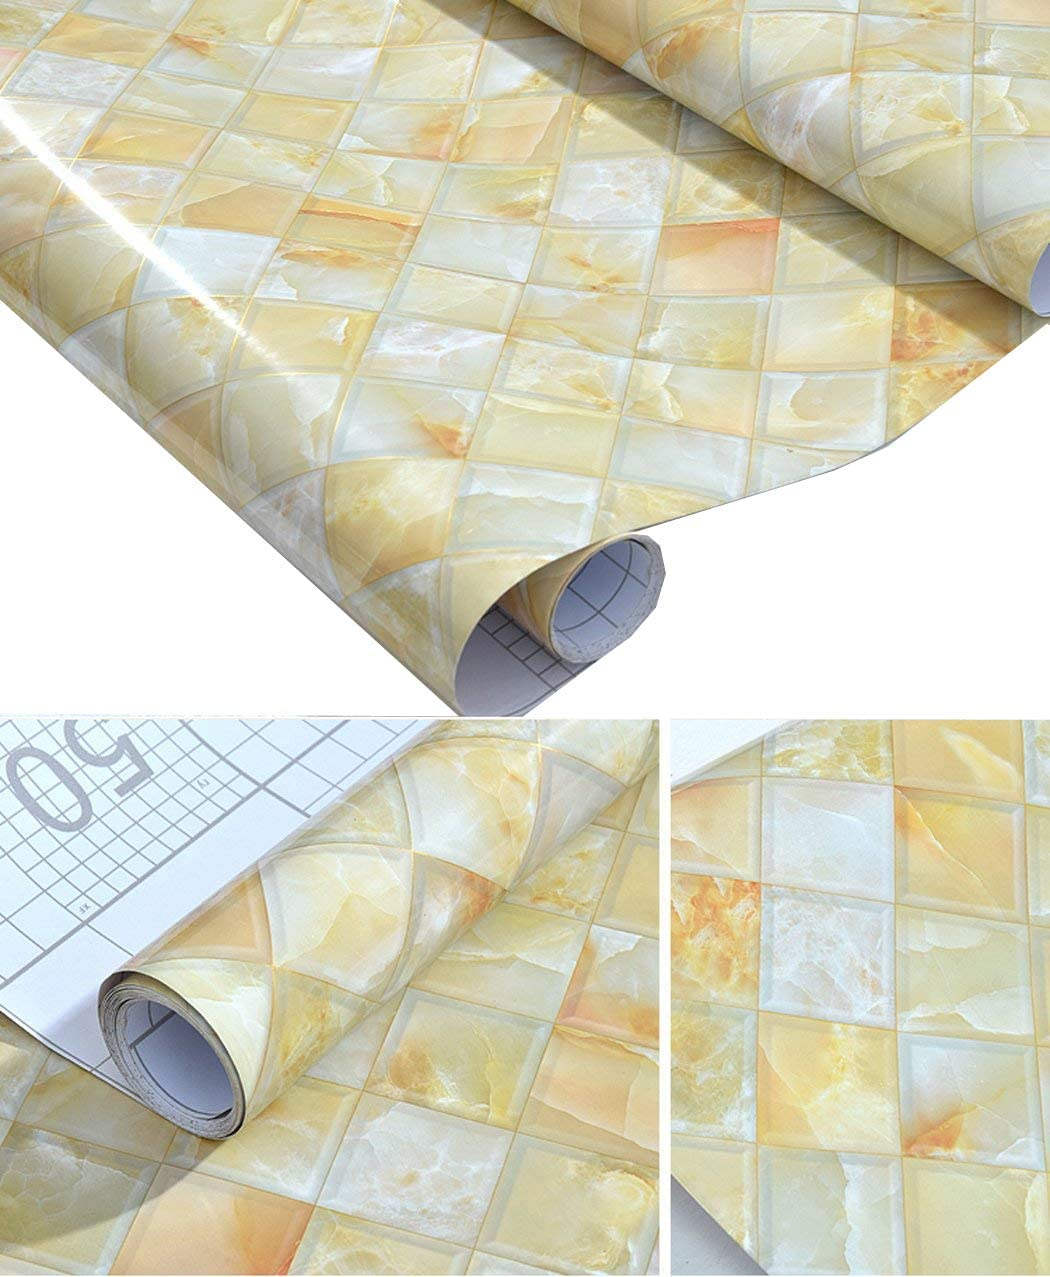 - Amazon.com - GLOW4U Faux Gloss Marble Tile Contact Paper Self